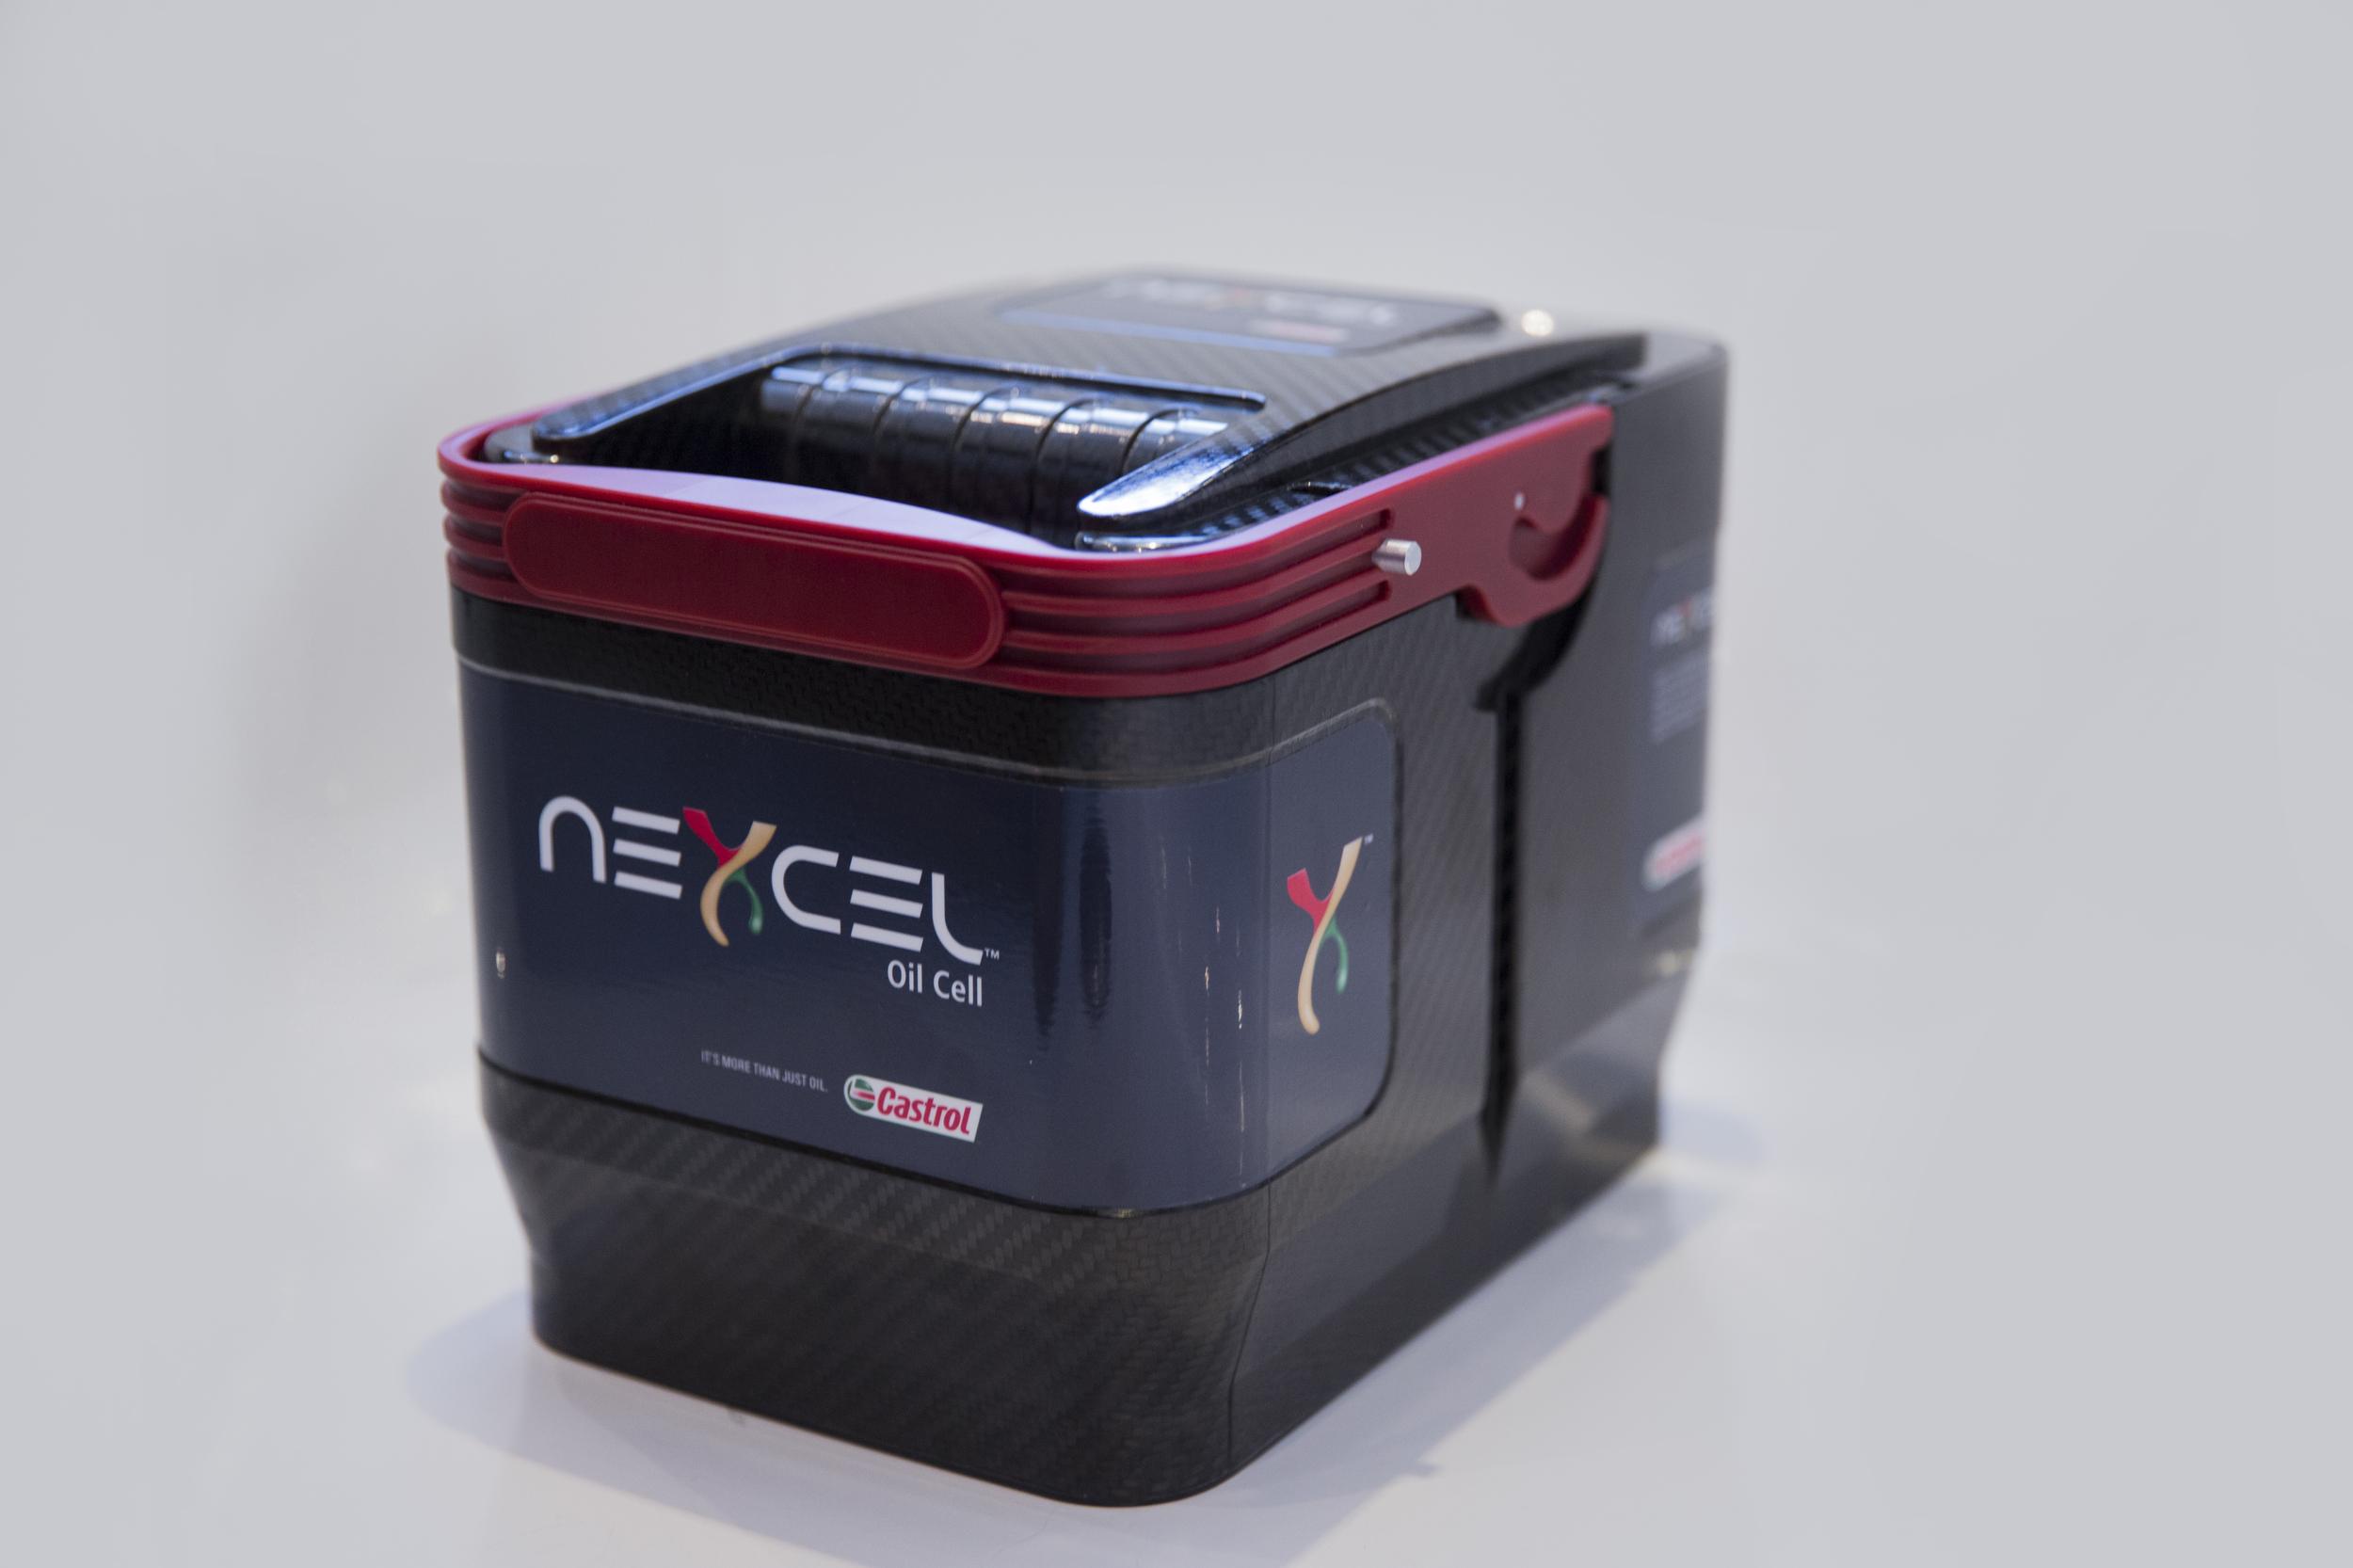 castrol-nexcel-005-1